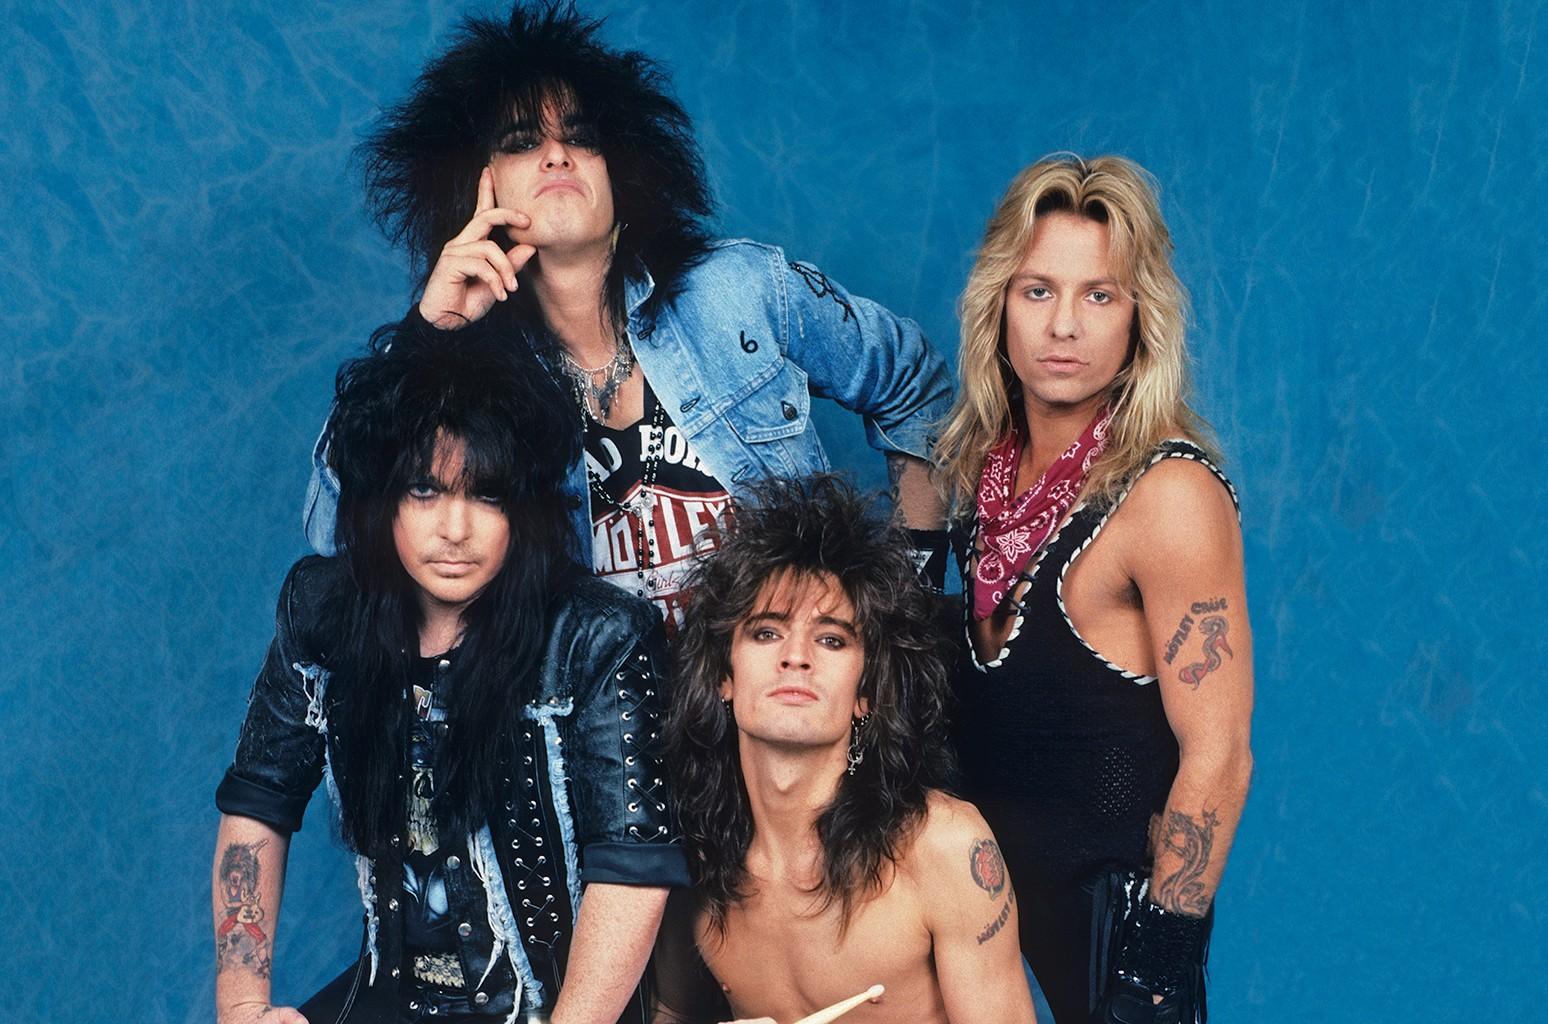 03 motley crue 1987 billboard 1548 compressed 10 Crazy Facts About Mötley Crüe